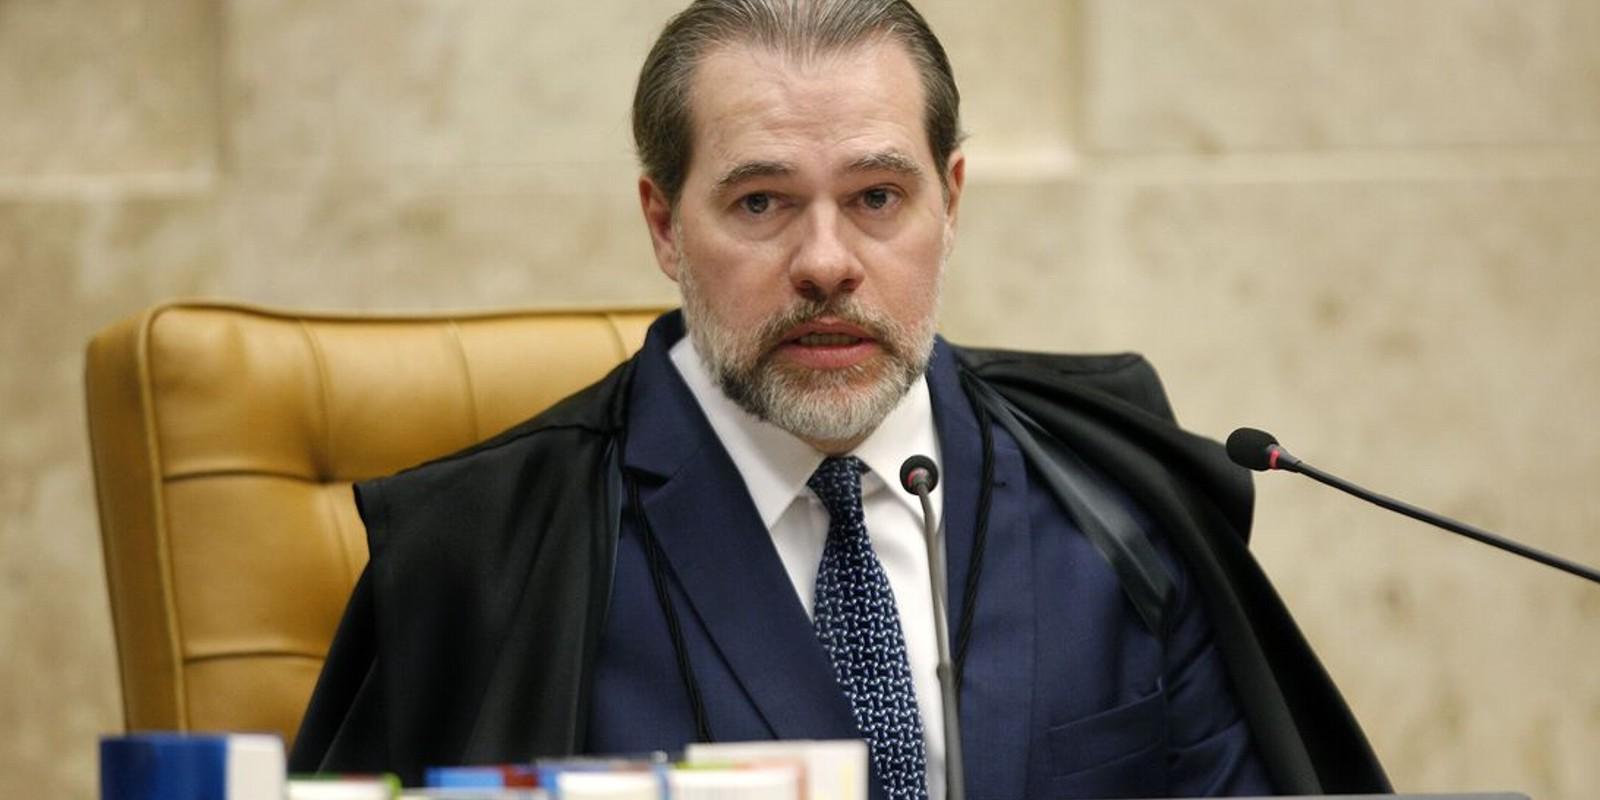 Por coincidência Toffoli suspende processo de Flávio Bolsonaro